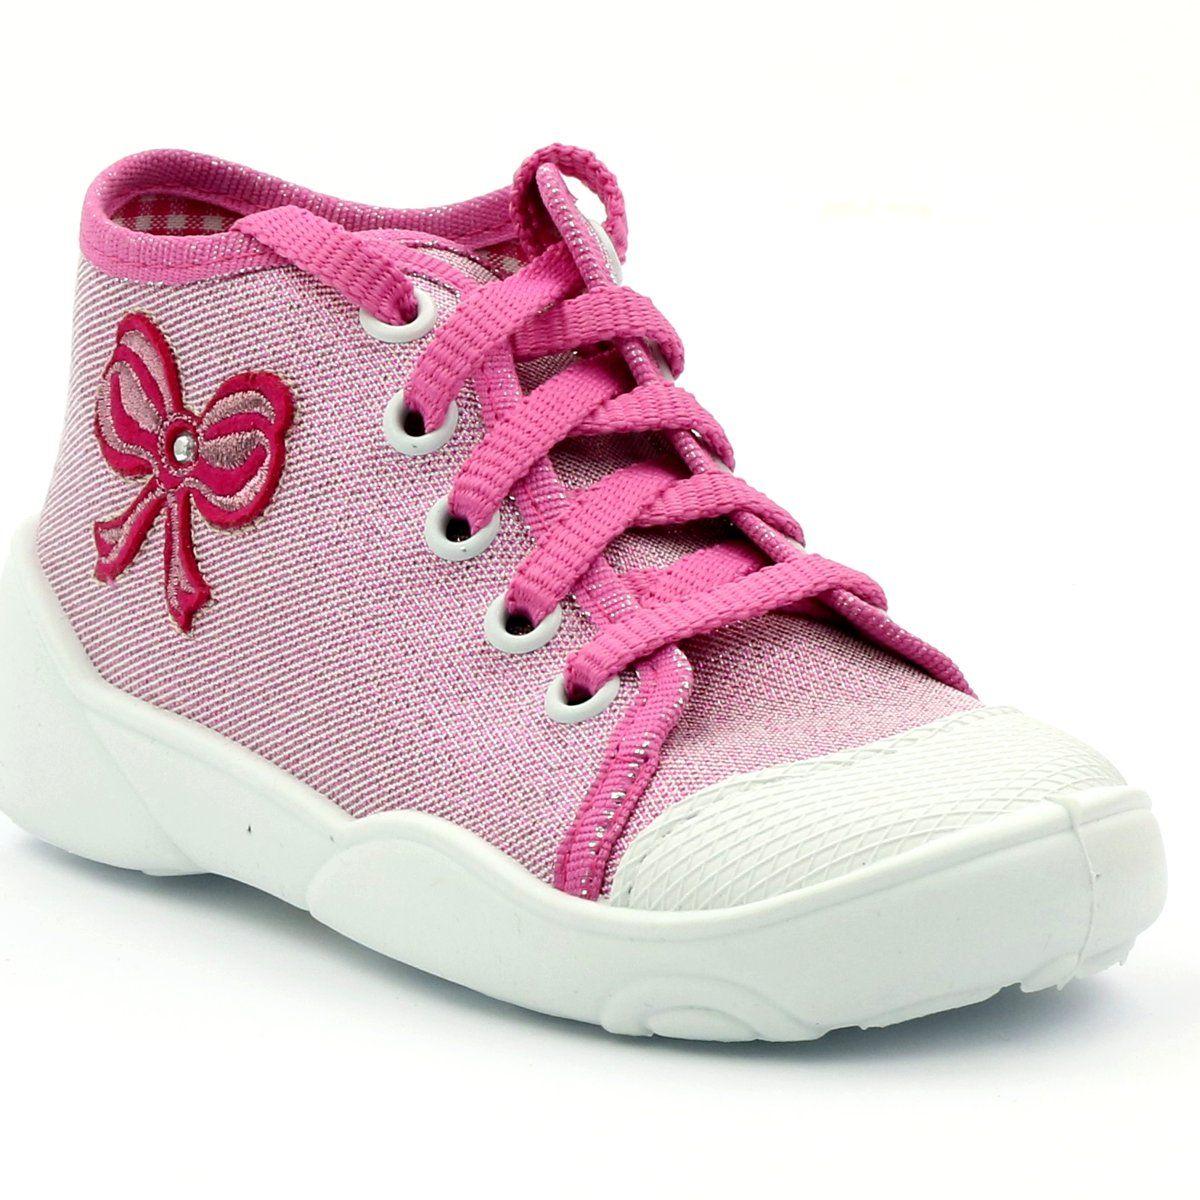 Befado Rozowe Obuwie Dzieciece 218p047 Baby Shoes Shoes Fashion